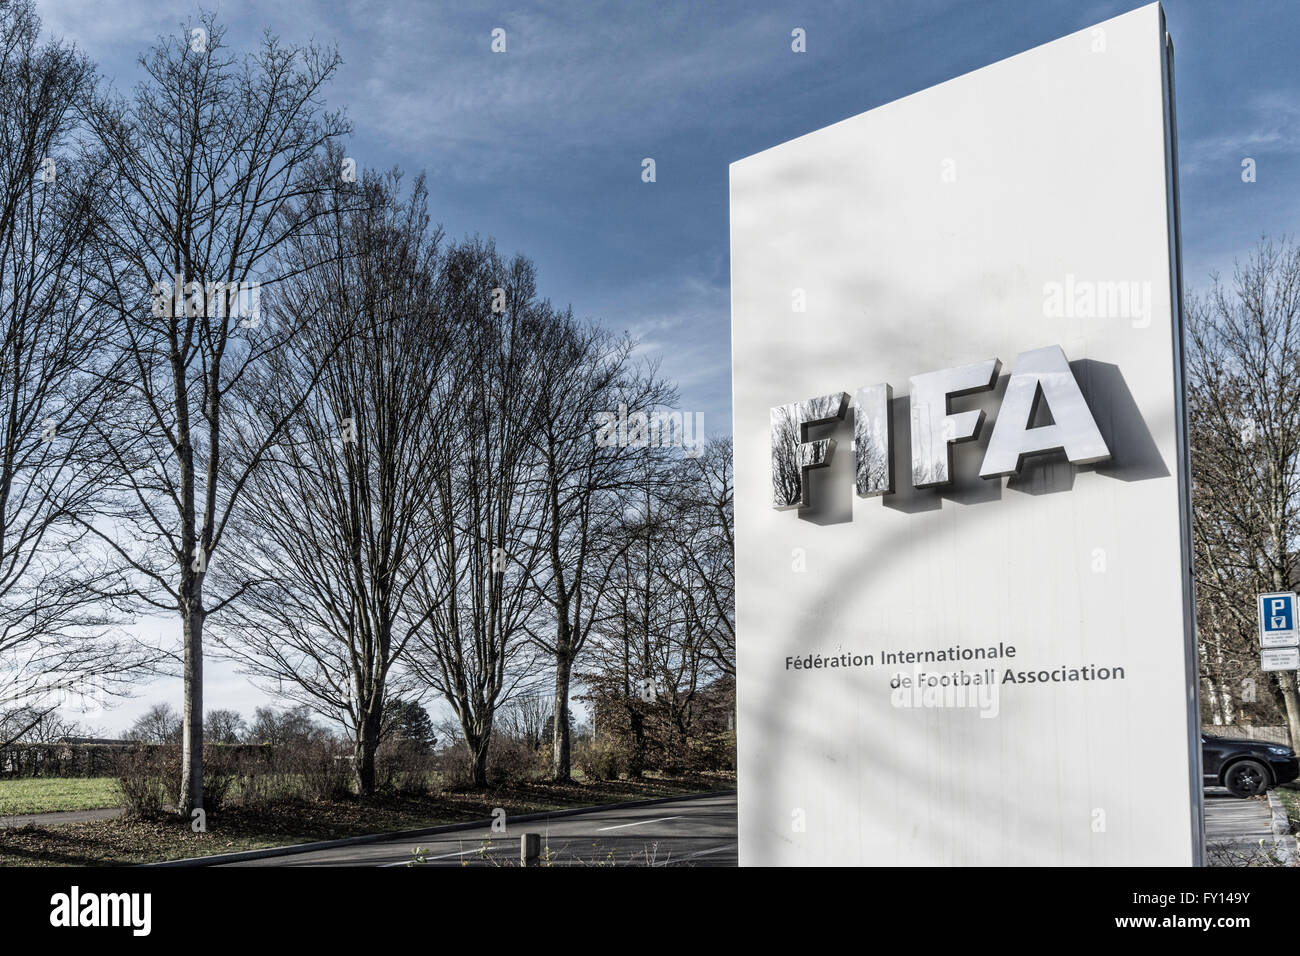 FIFA, Fédération Internationale de Football Association, Zürich Stockbild